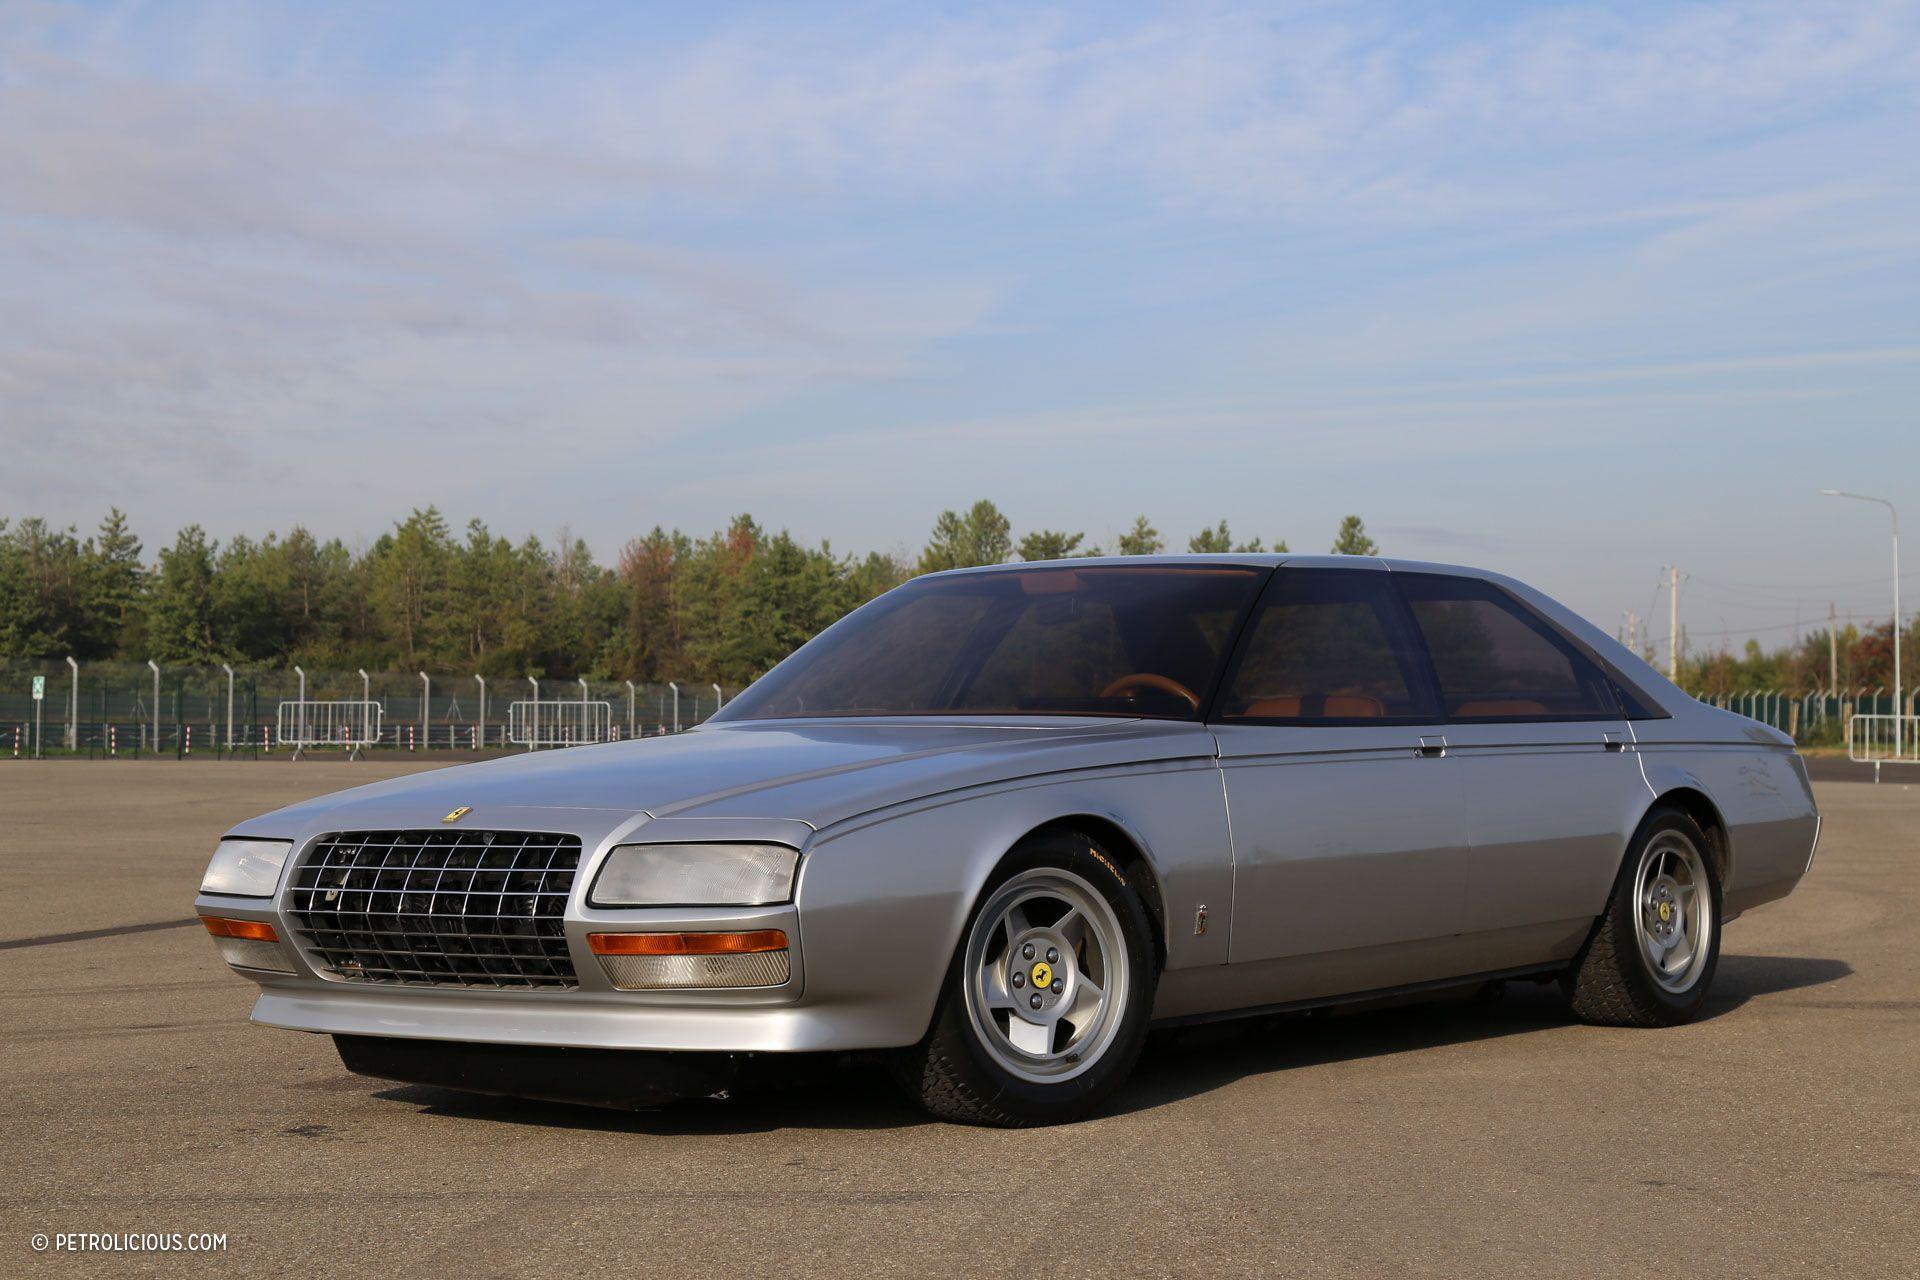 We Slip Behind The Wheel Of The Worldu0027s Only Four Door Ferrari. Concept  CarsFerrari U2026